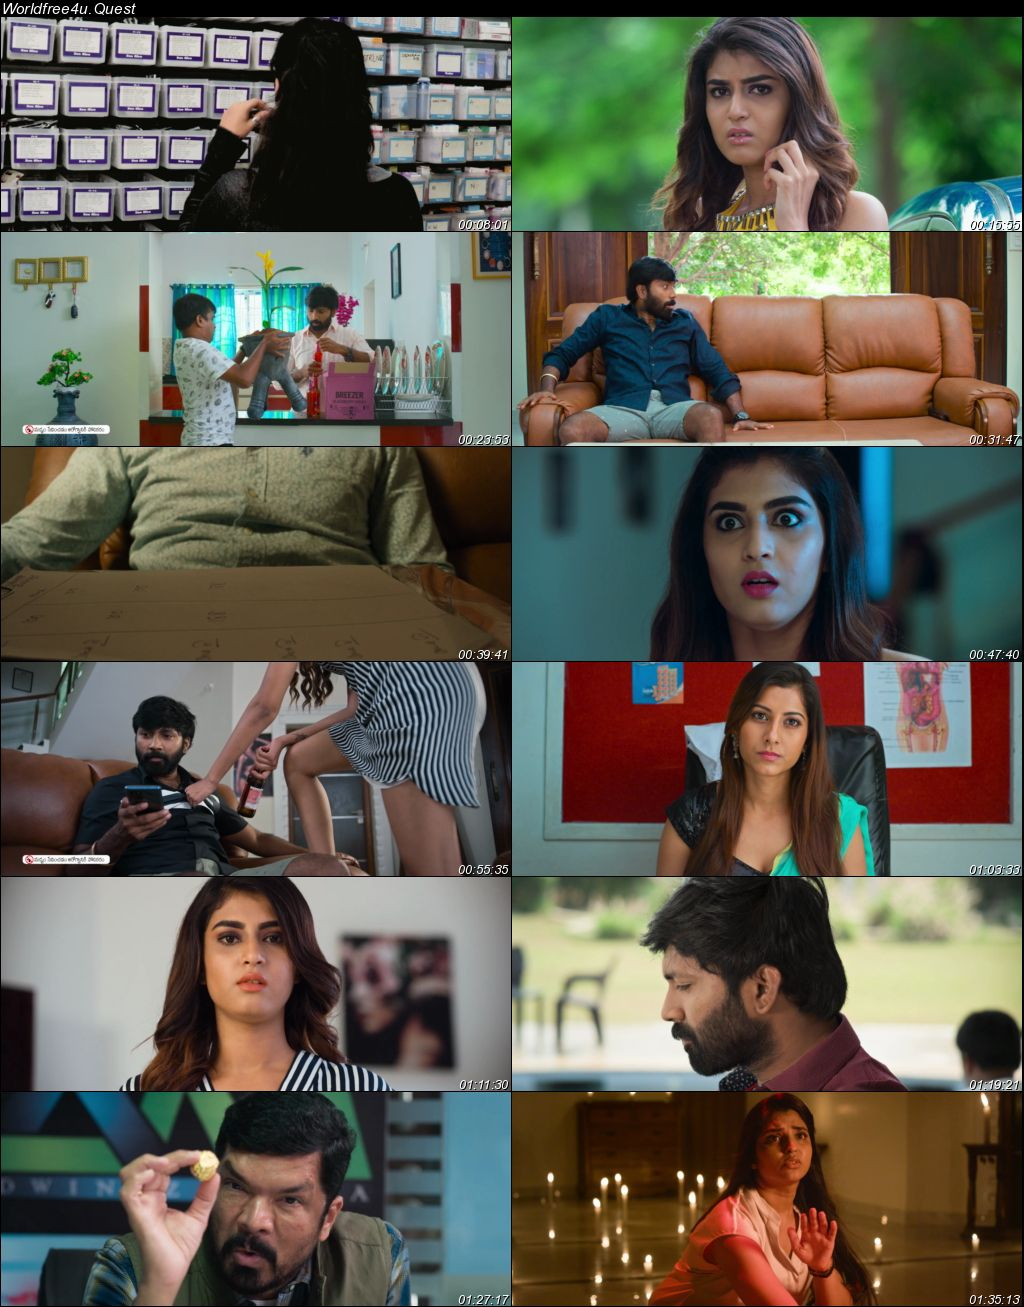 Tempt Raja 2021 Hindi Dubbed Movie Download || HDRip 1080p || 720p || 480p